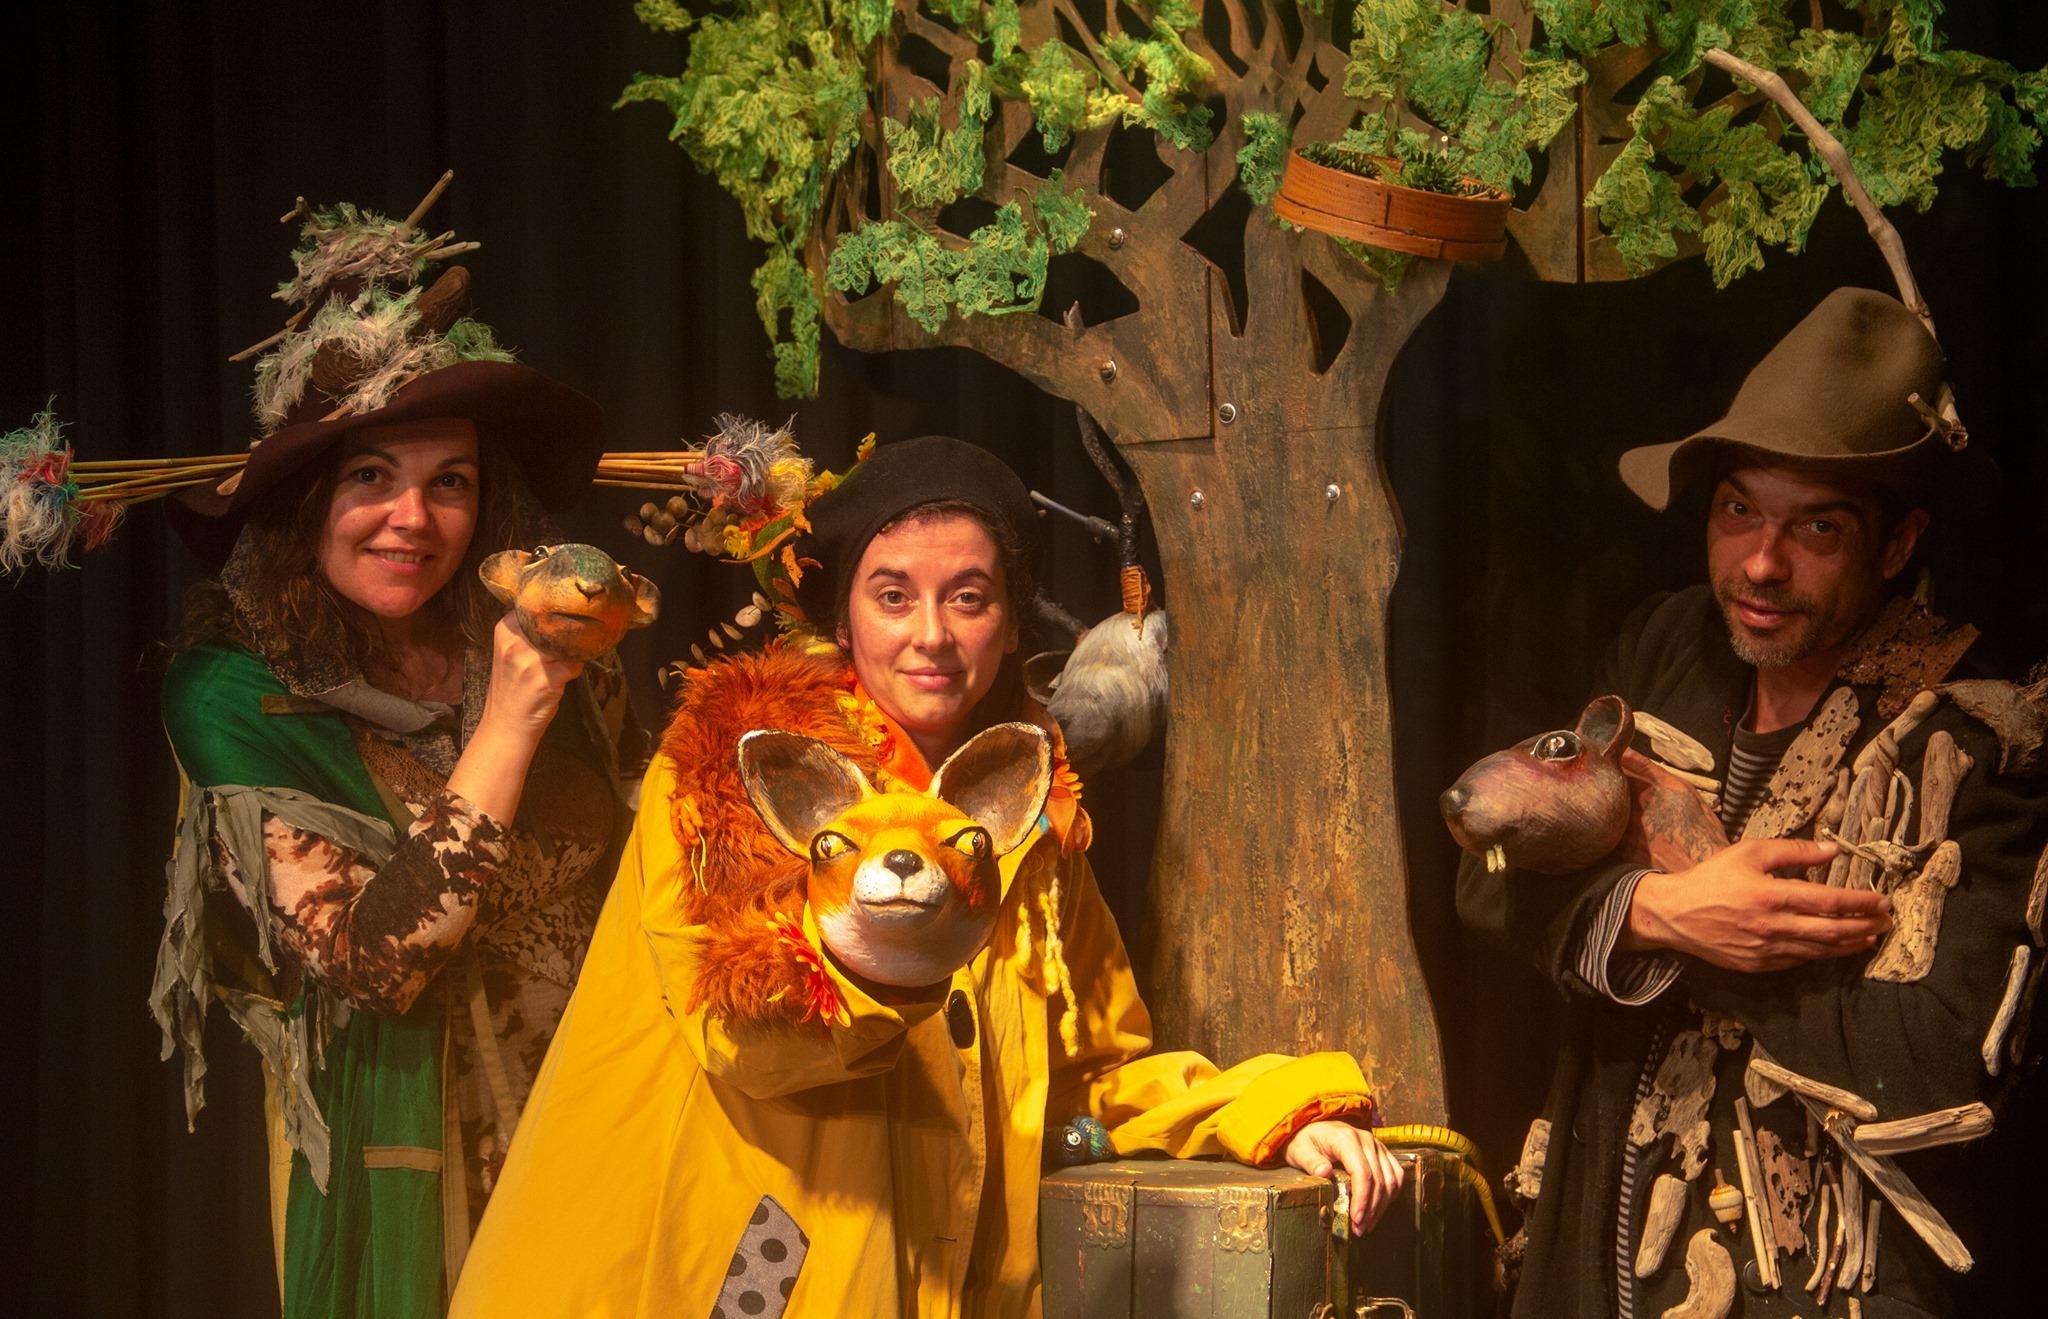 Encontro Internacional de Marionetas regressa a Gondomar em Julho